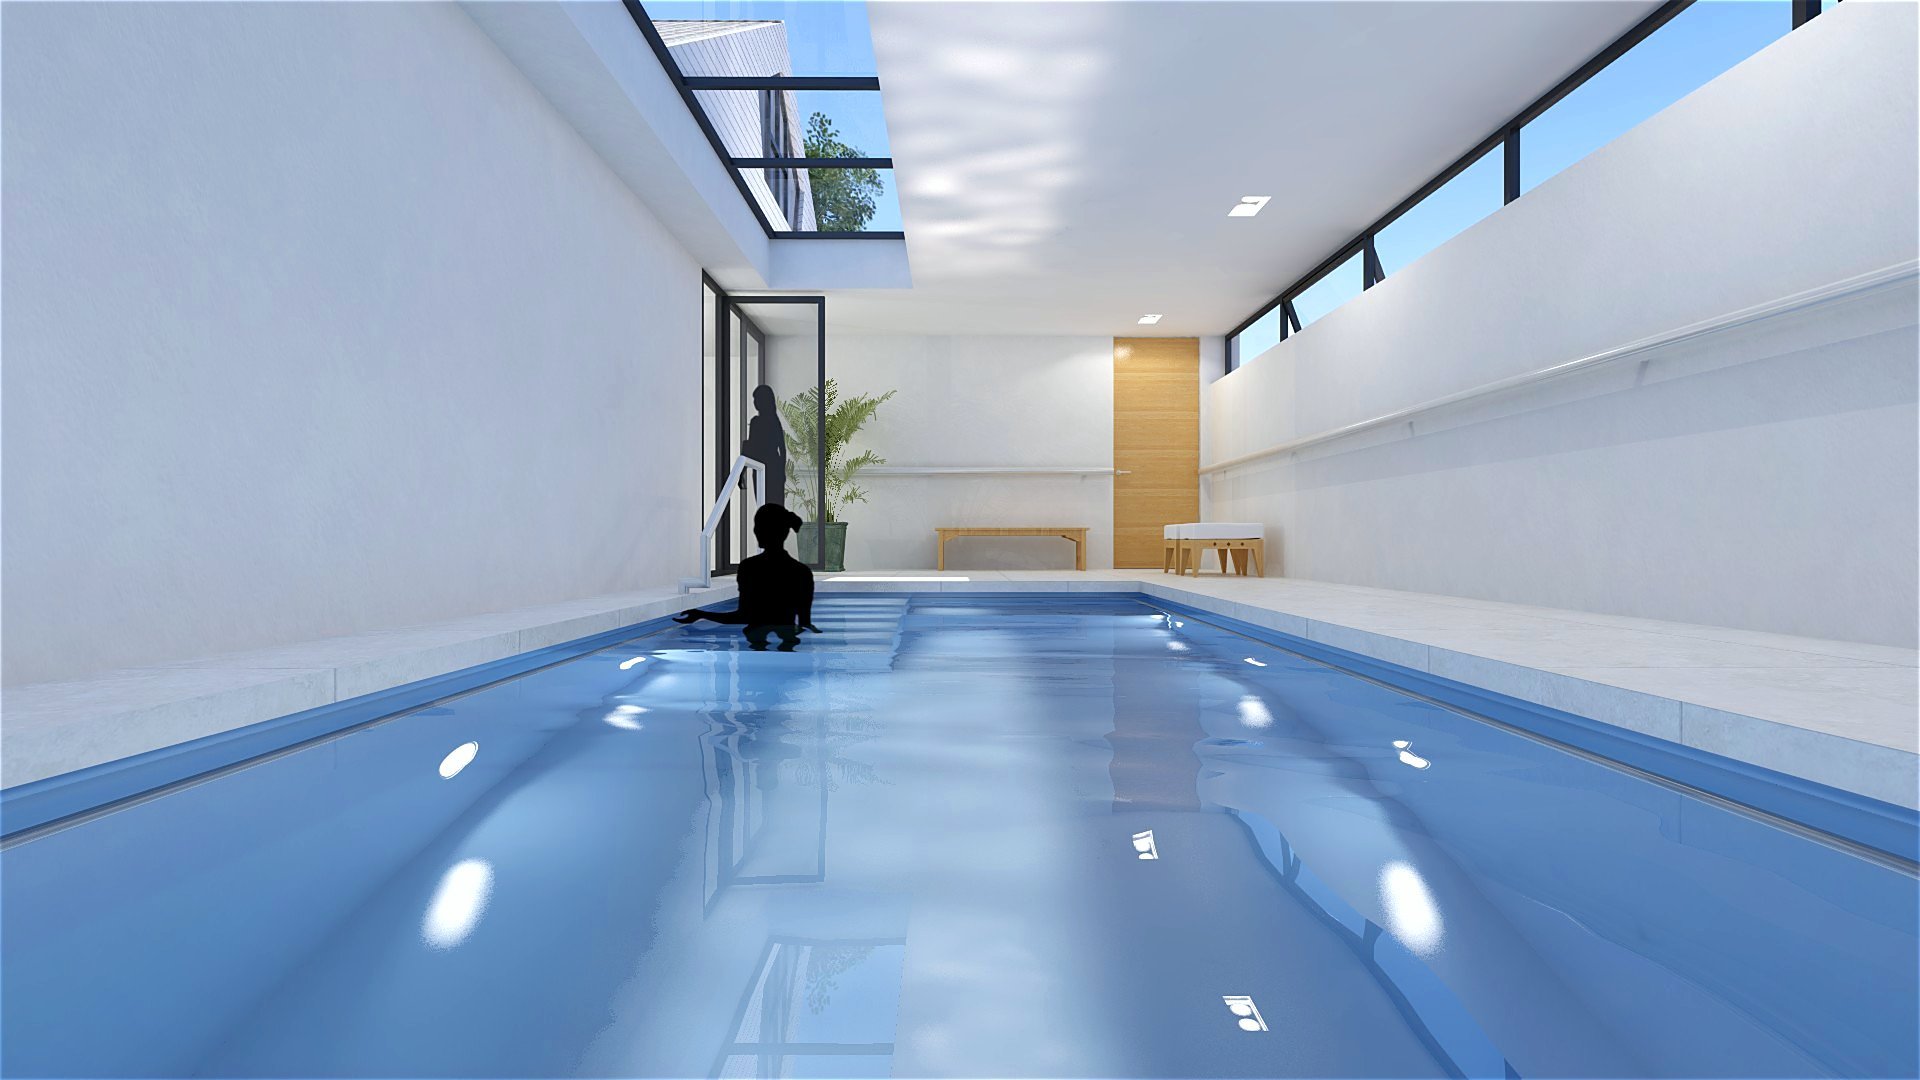 Jury ontwerpt binnenzwembad aan woning jury for Binnenzwembad bouwen